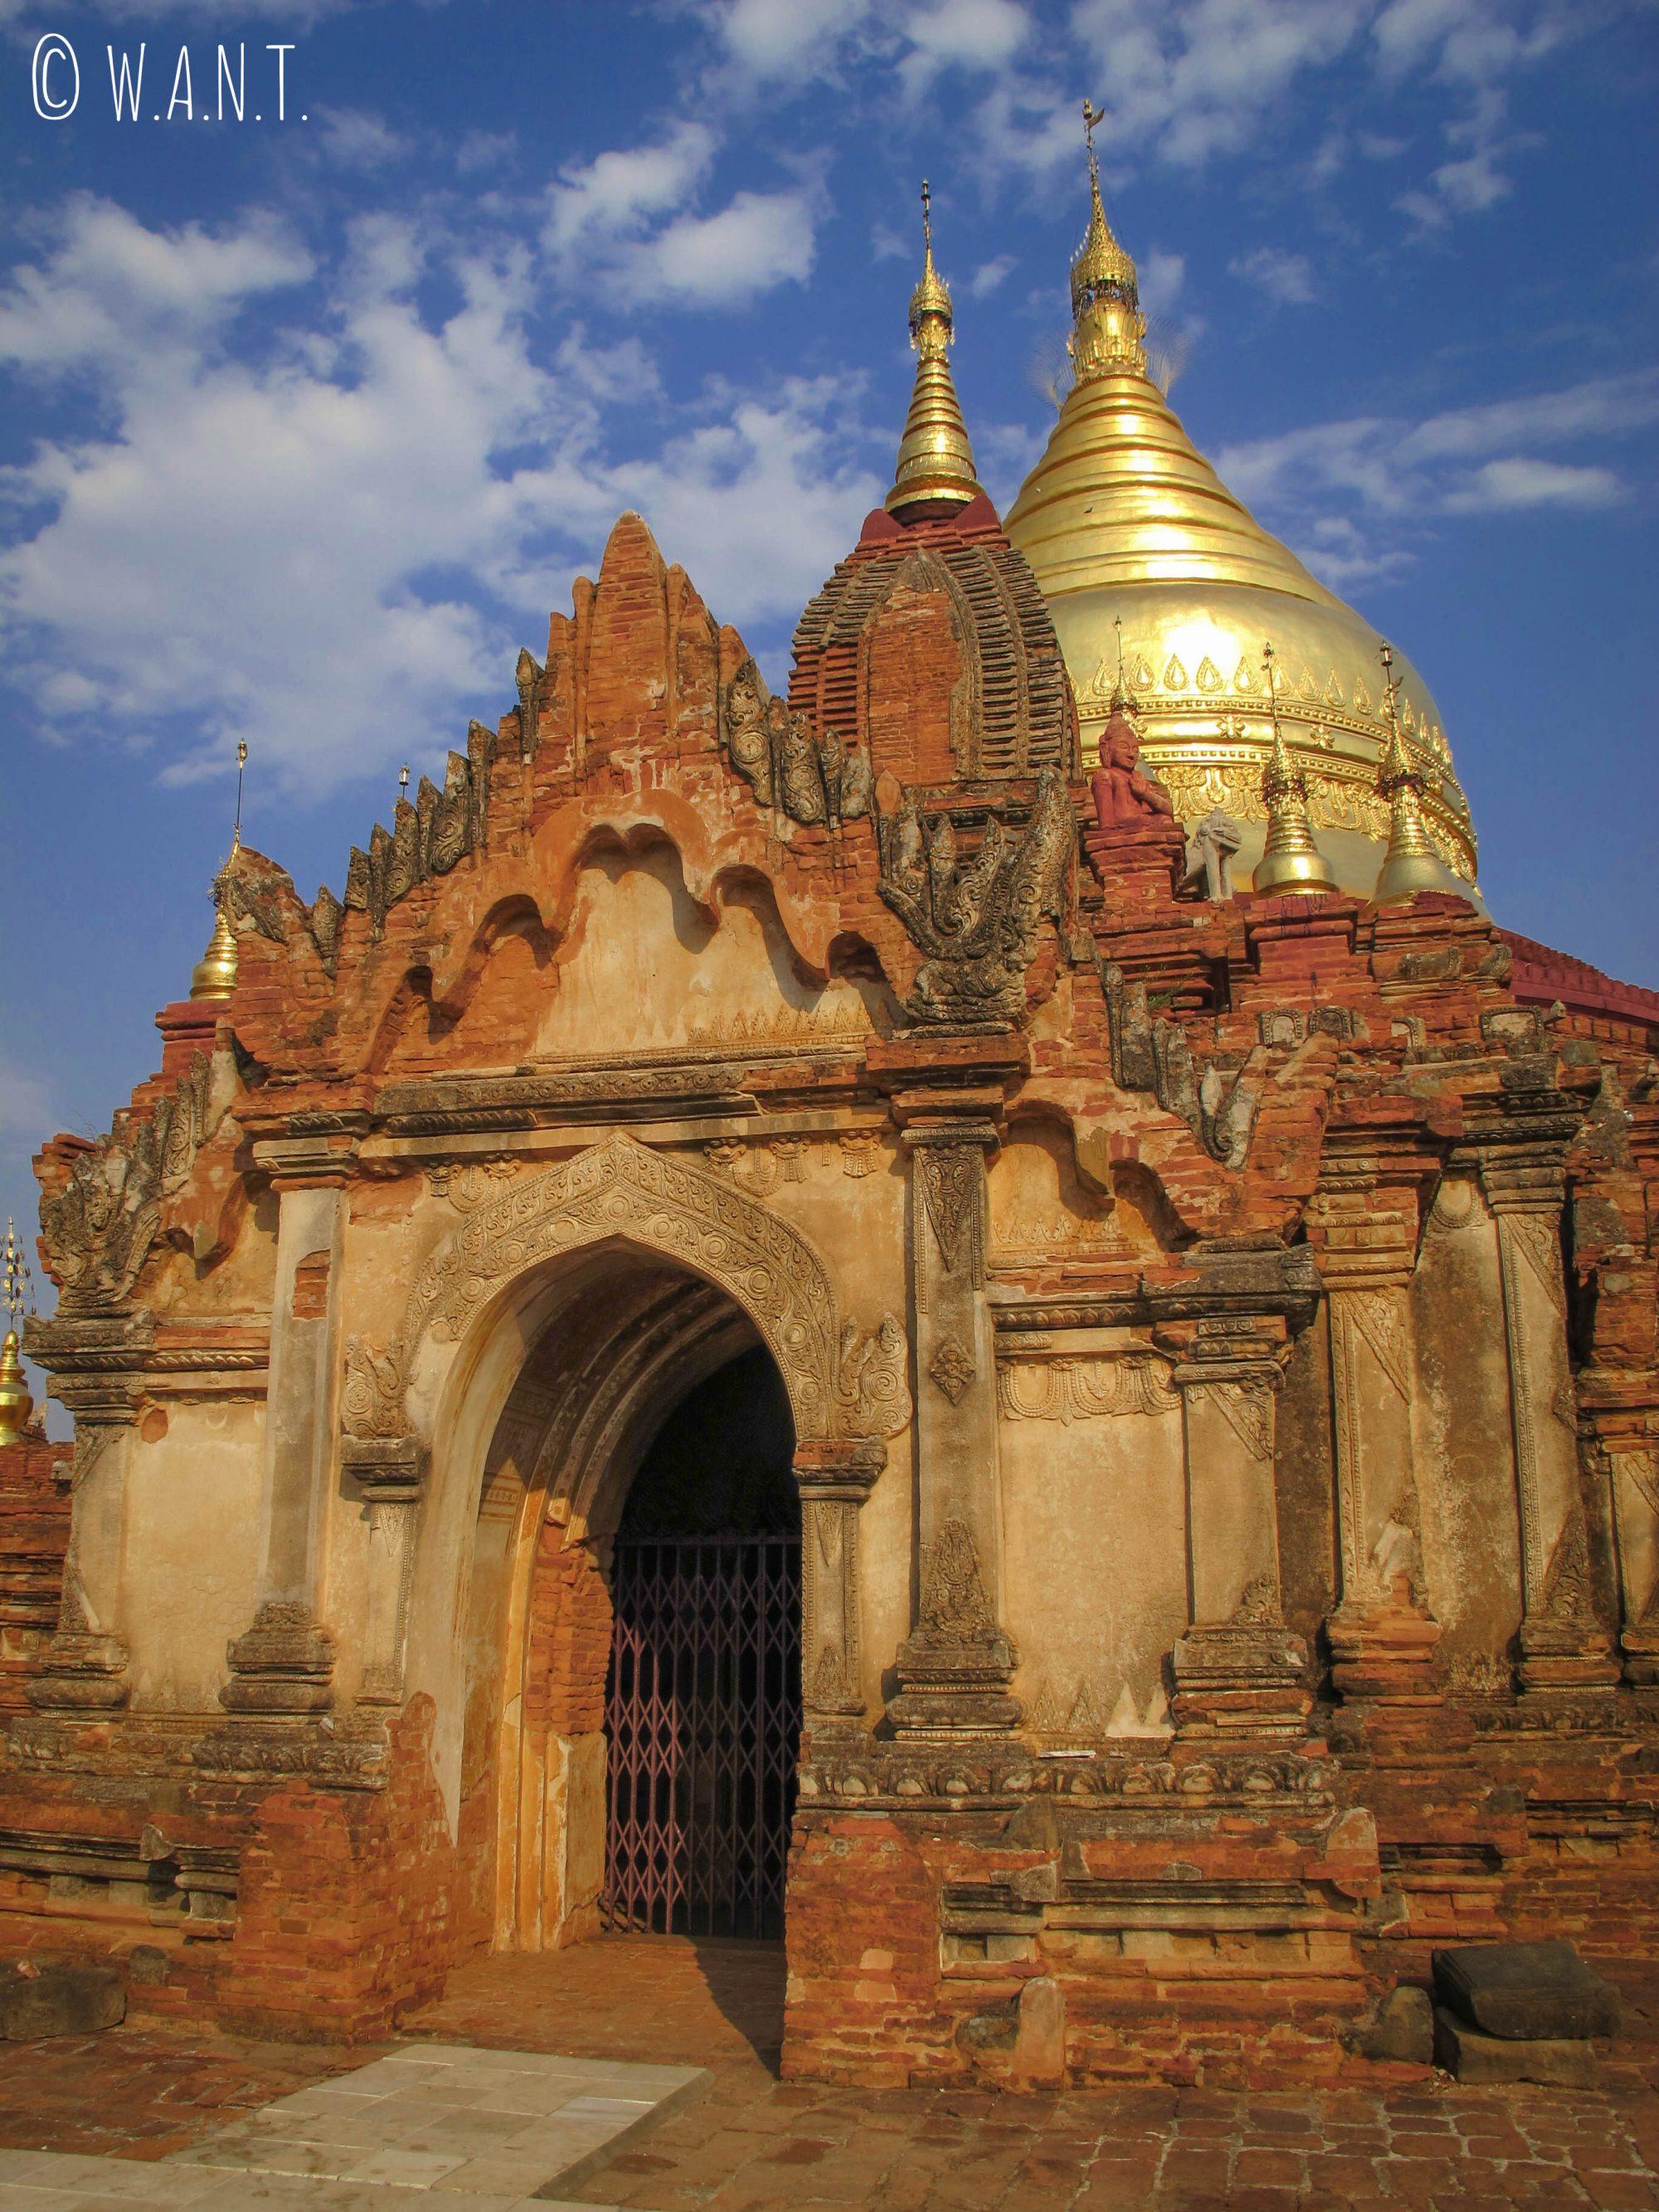 Magnifique architecture de la pagode Dhammayanzika